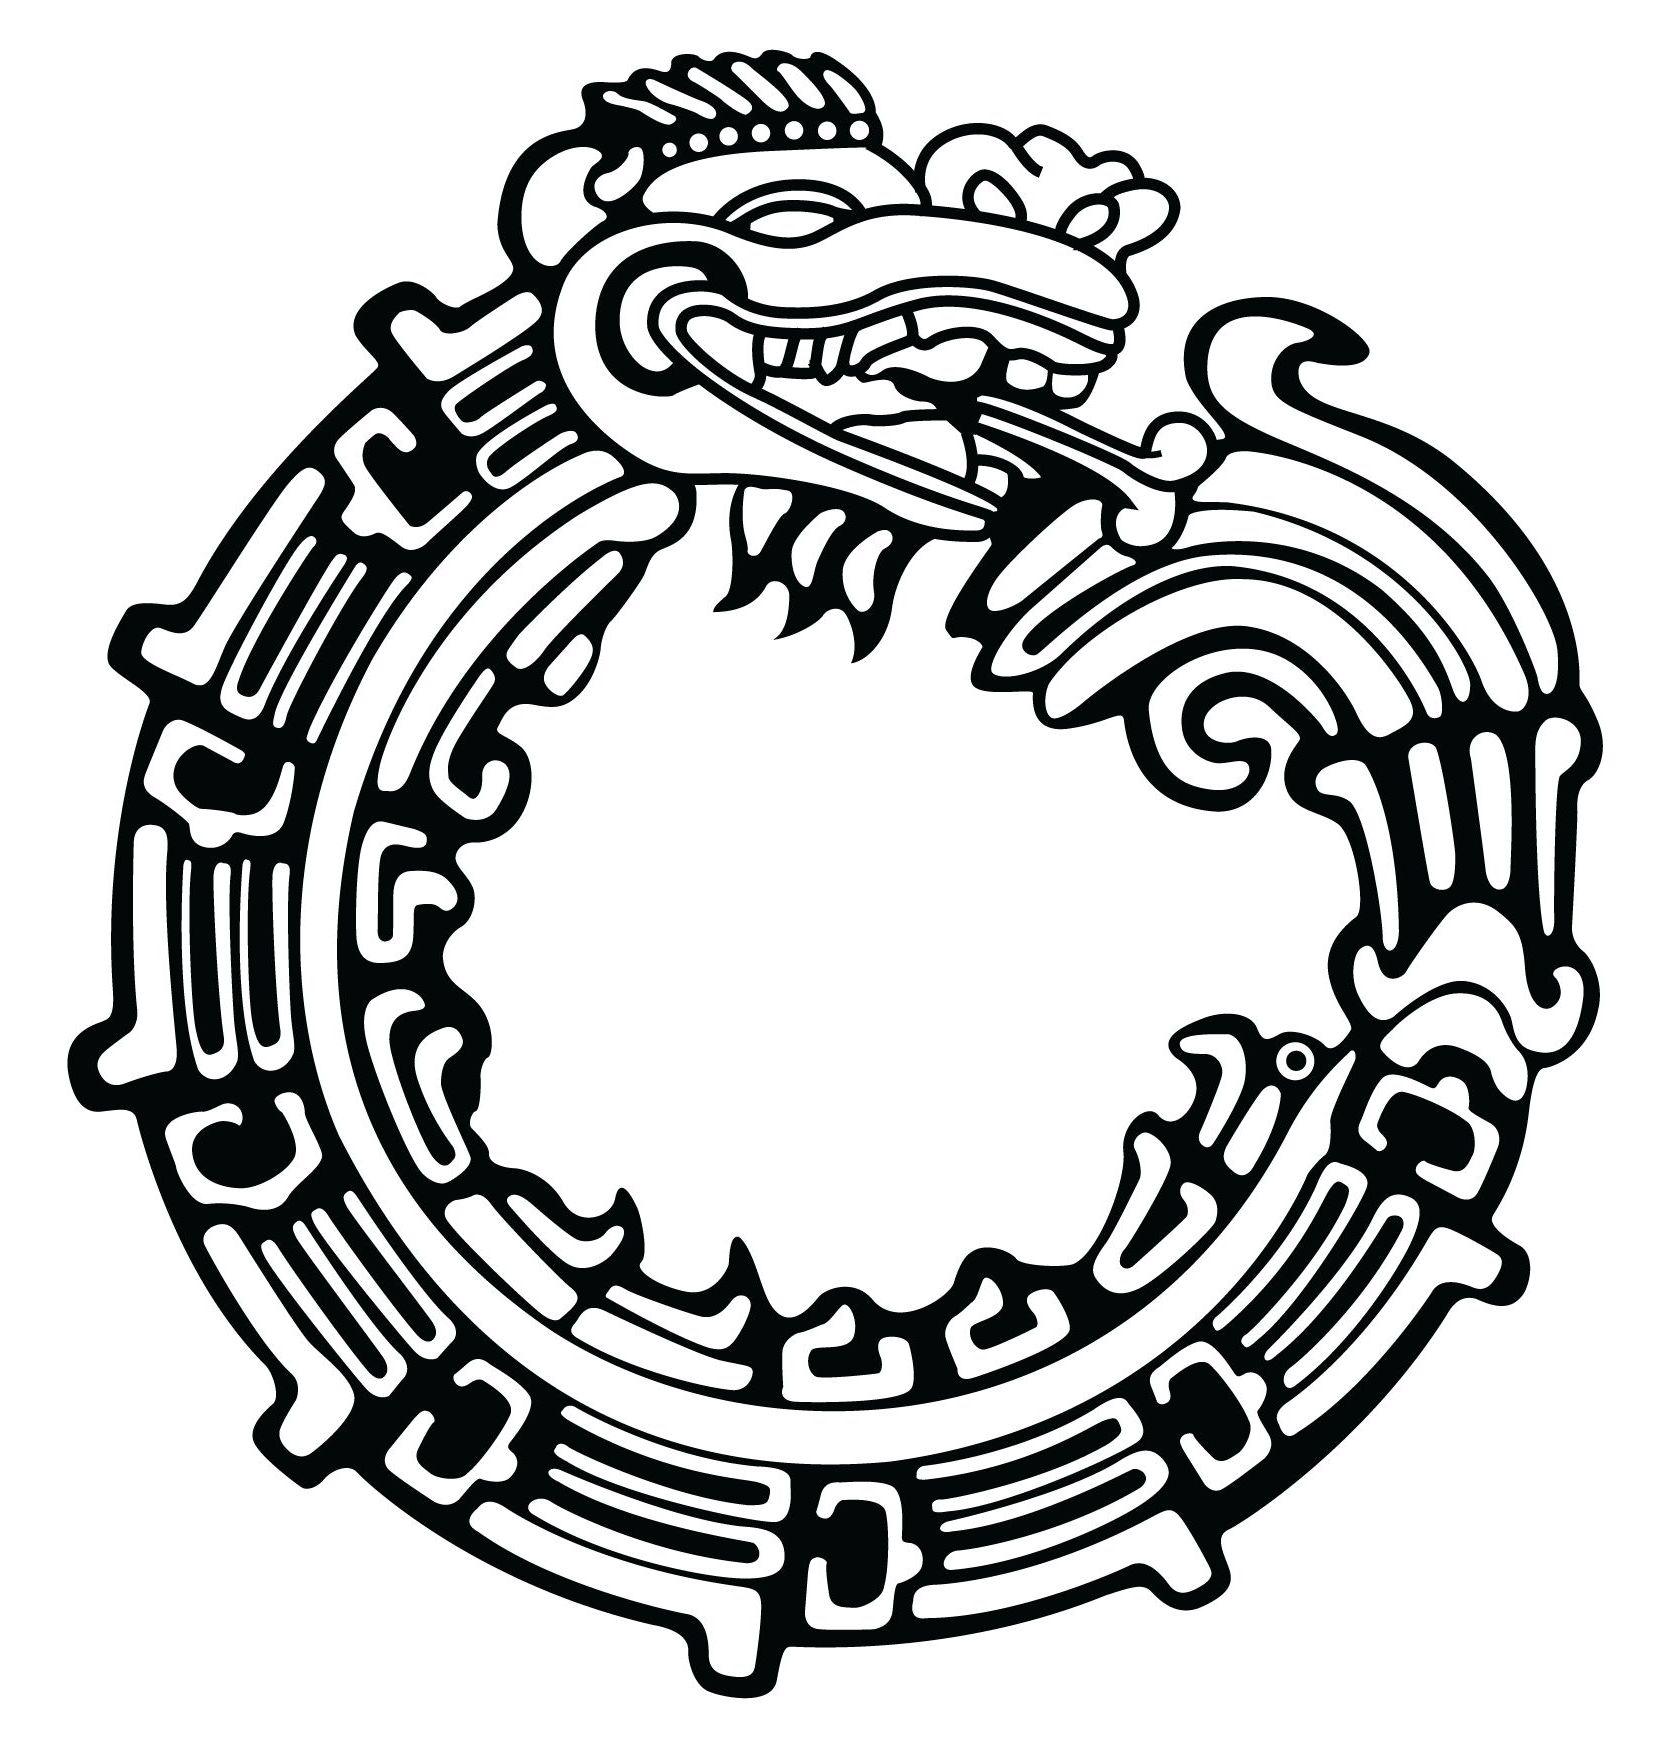 Free Aztec Art Black And White, Download Free Clip Art, Free.